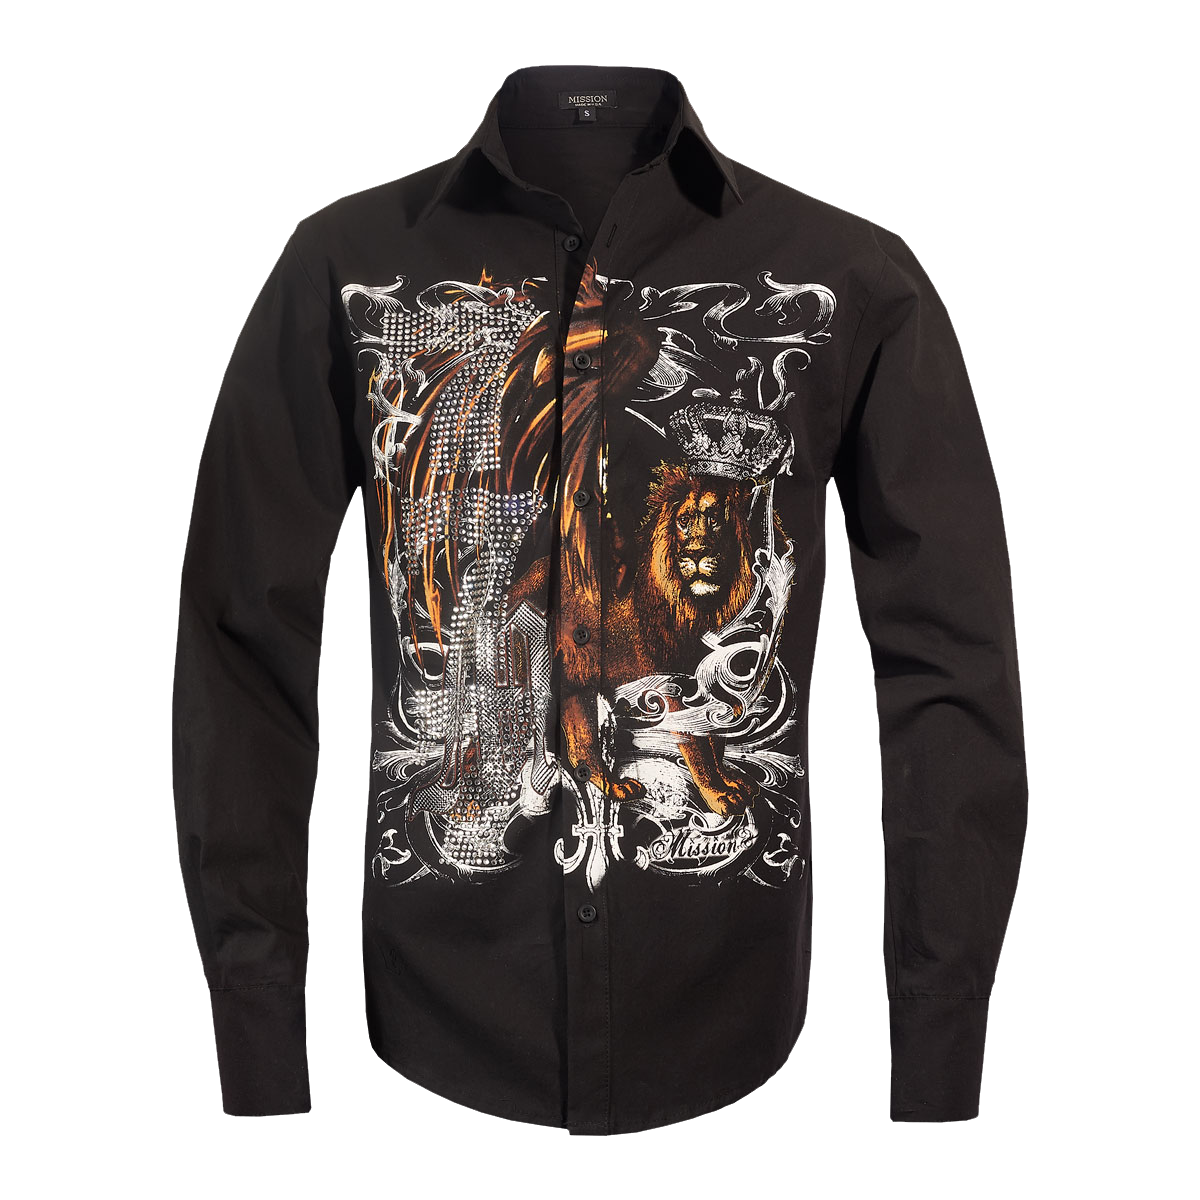 Michael Jackson x Mission Crystal Lion Long Sleeve Shirt - Black